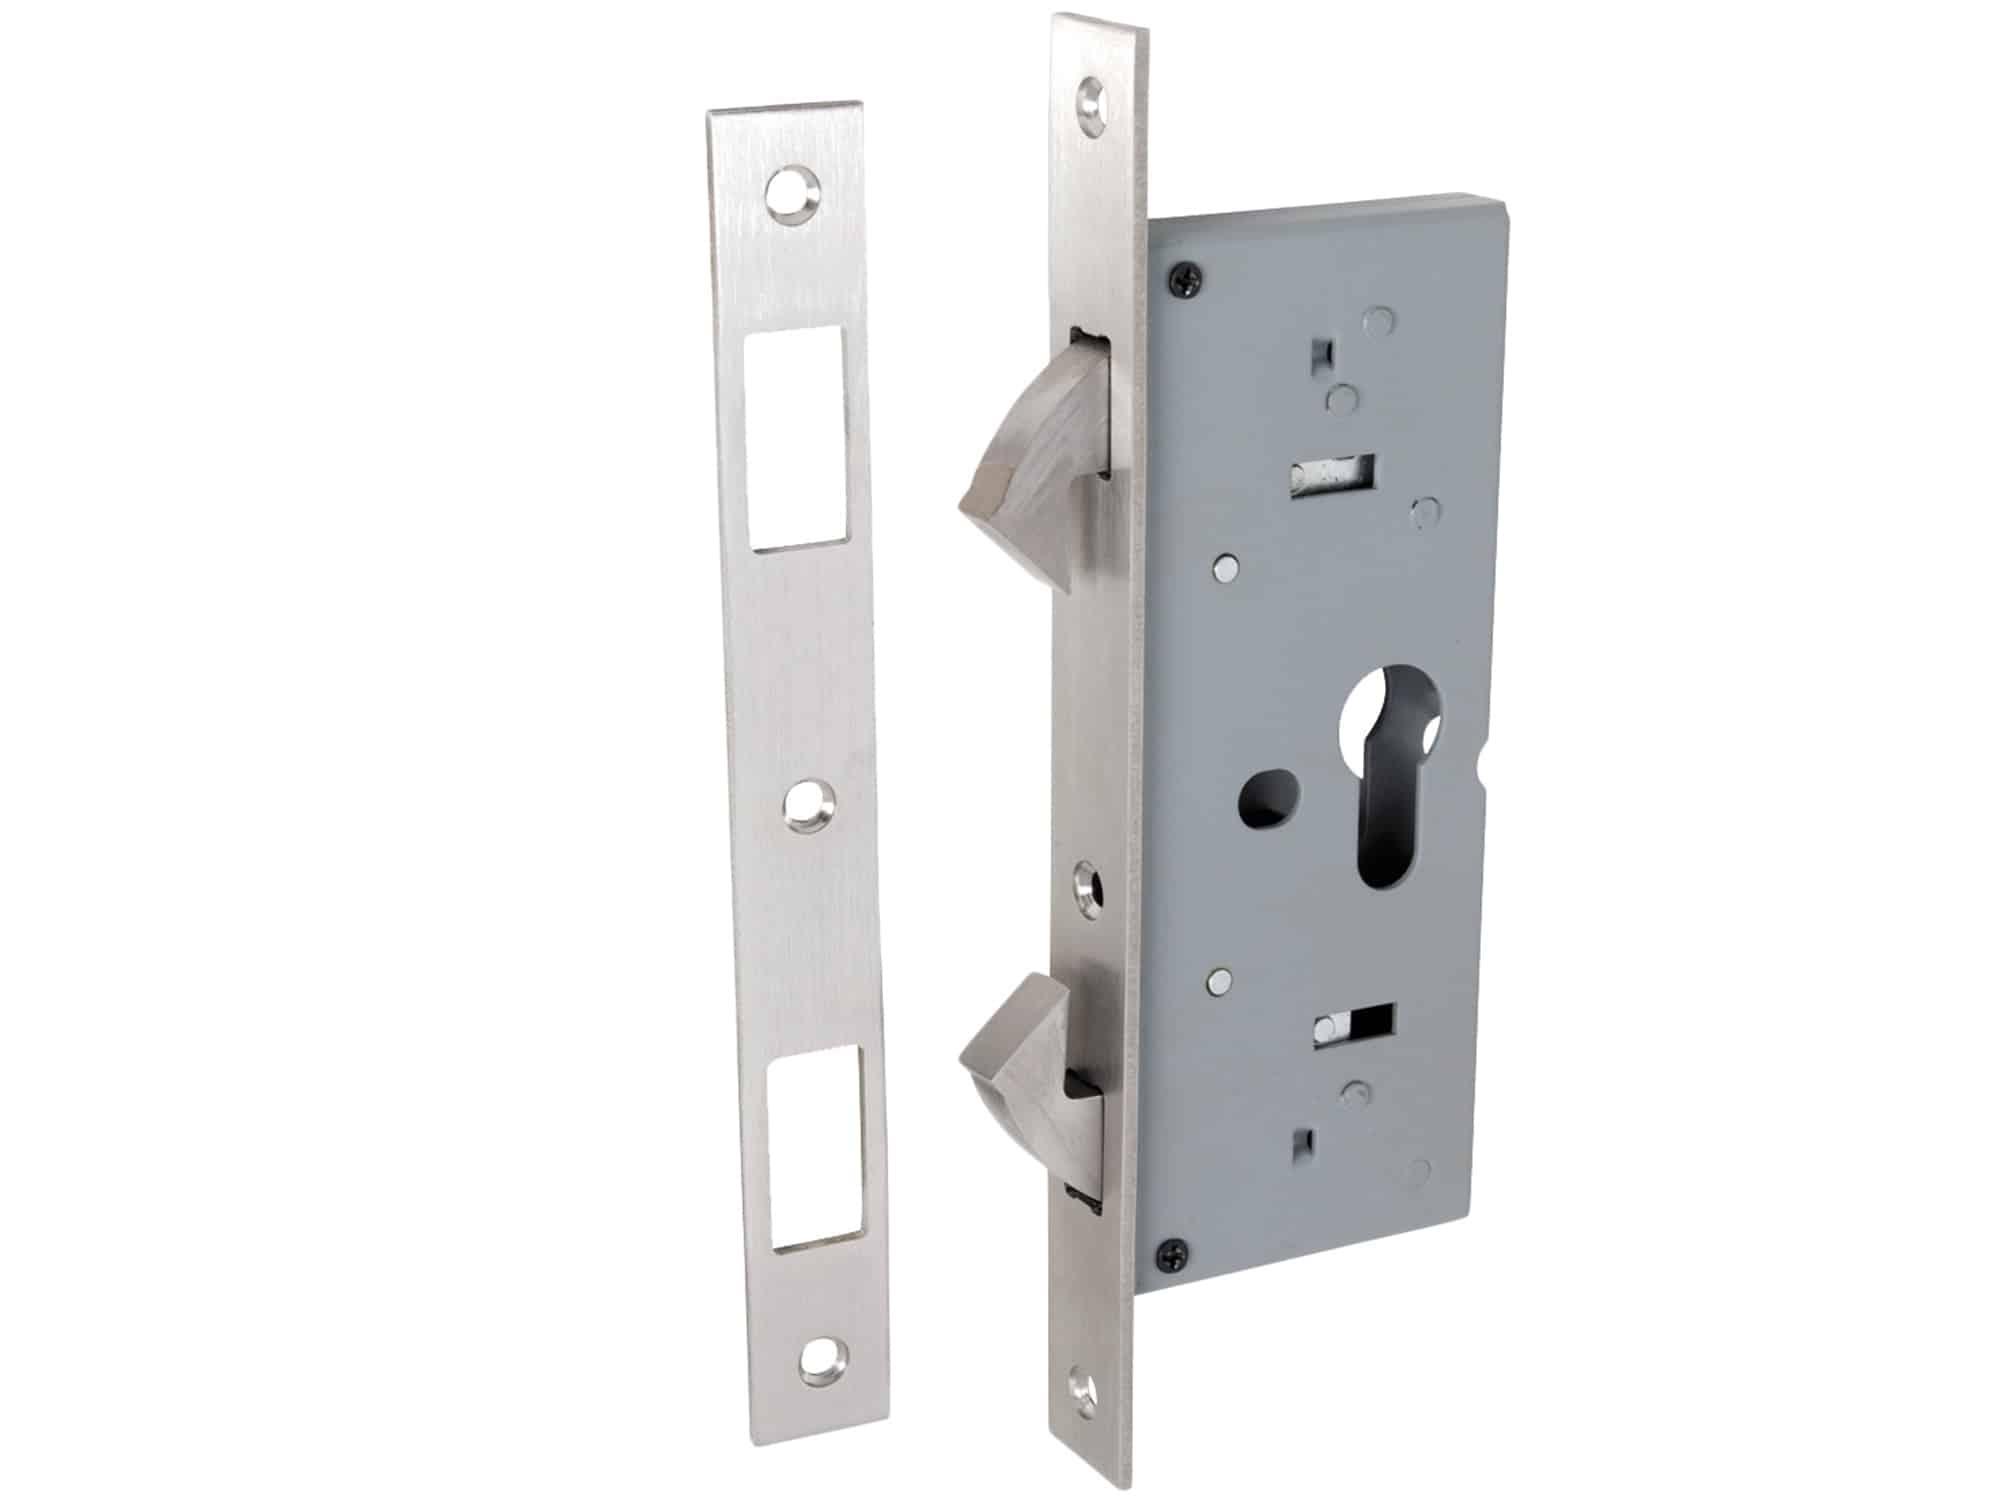 Tradco 45mm Backset Sliding Door Lock Key Locking Residential Mortice Lock Interior Effects